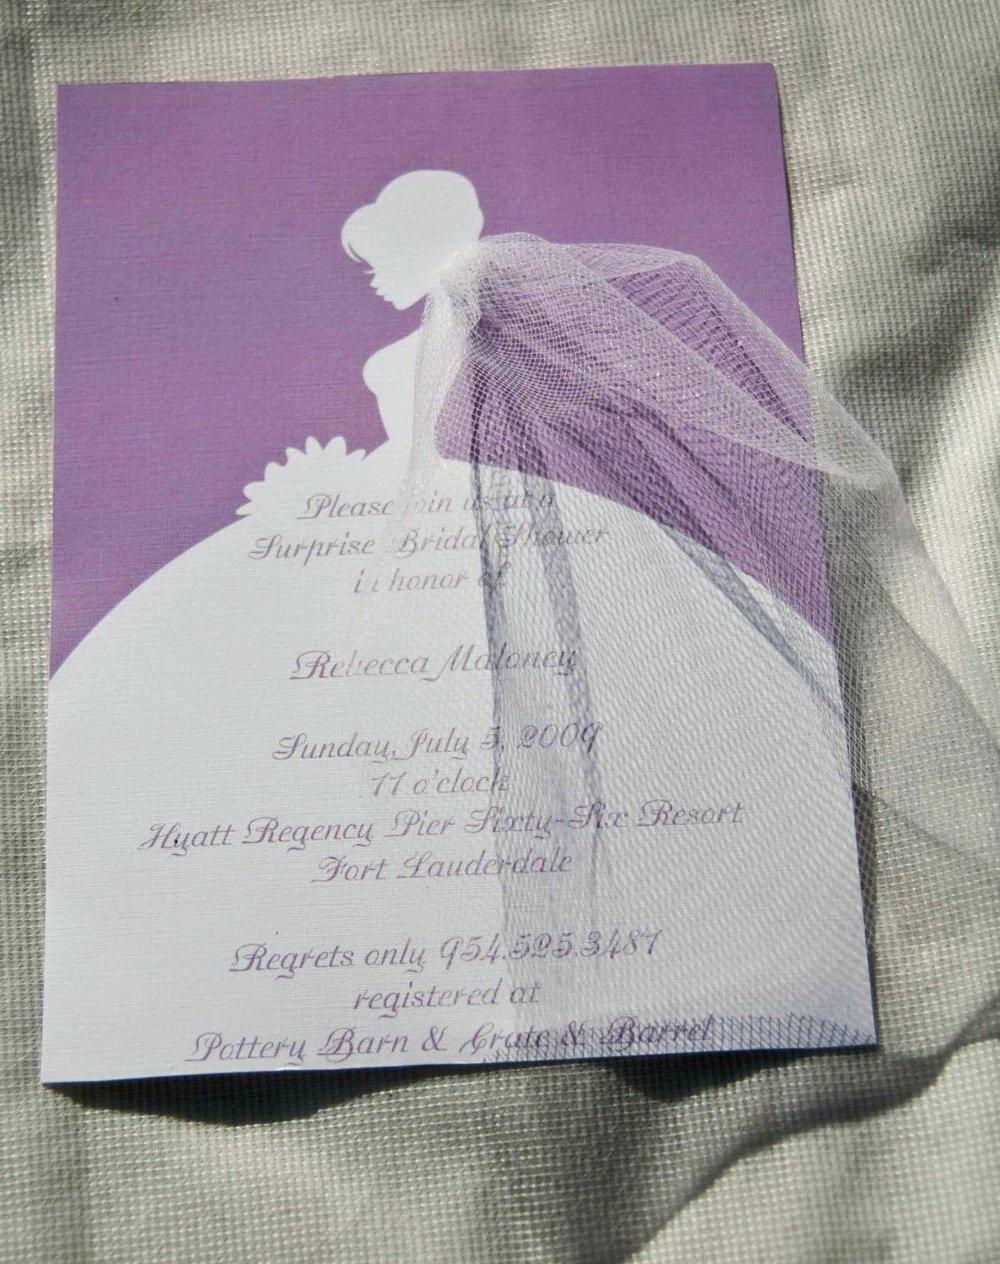 Fall Bridal Shower Invitation Templates